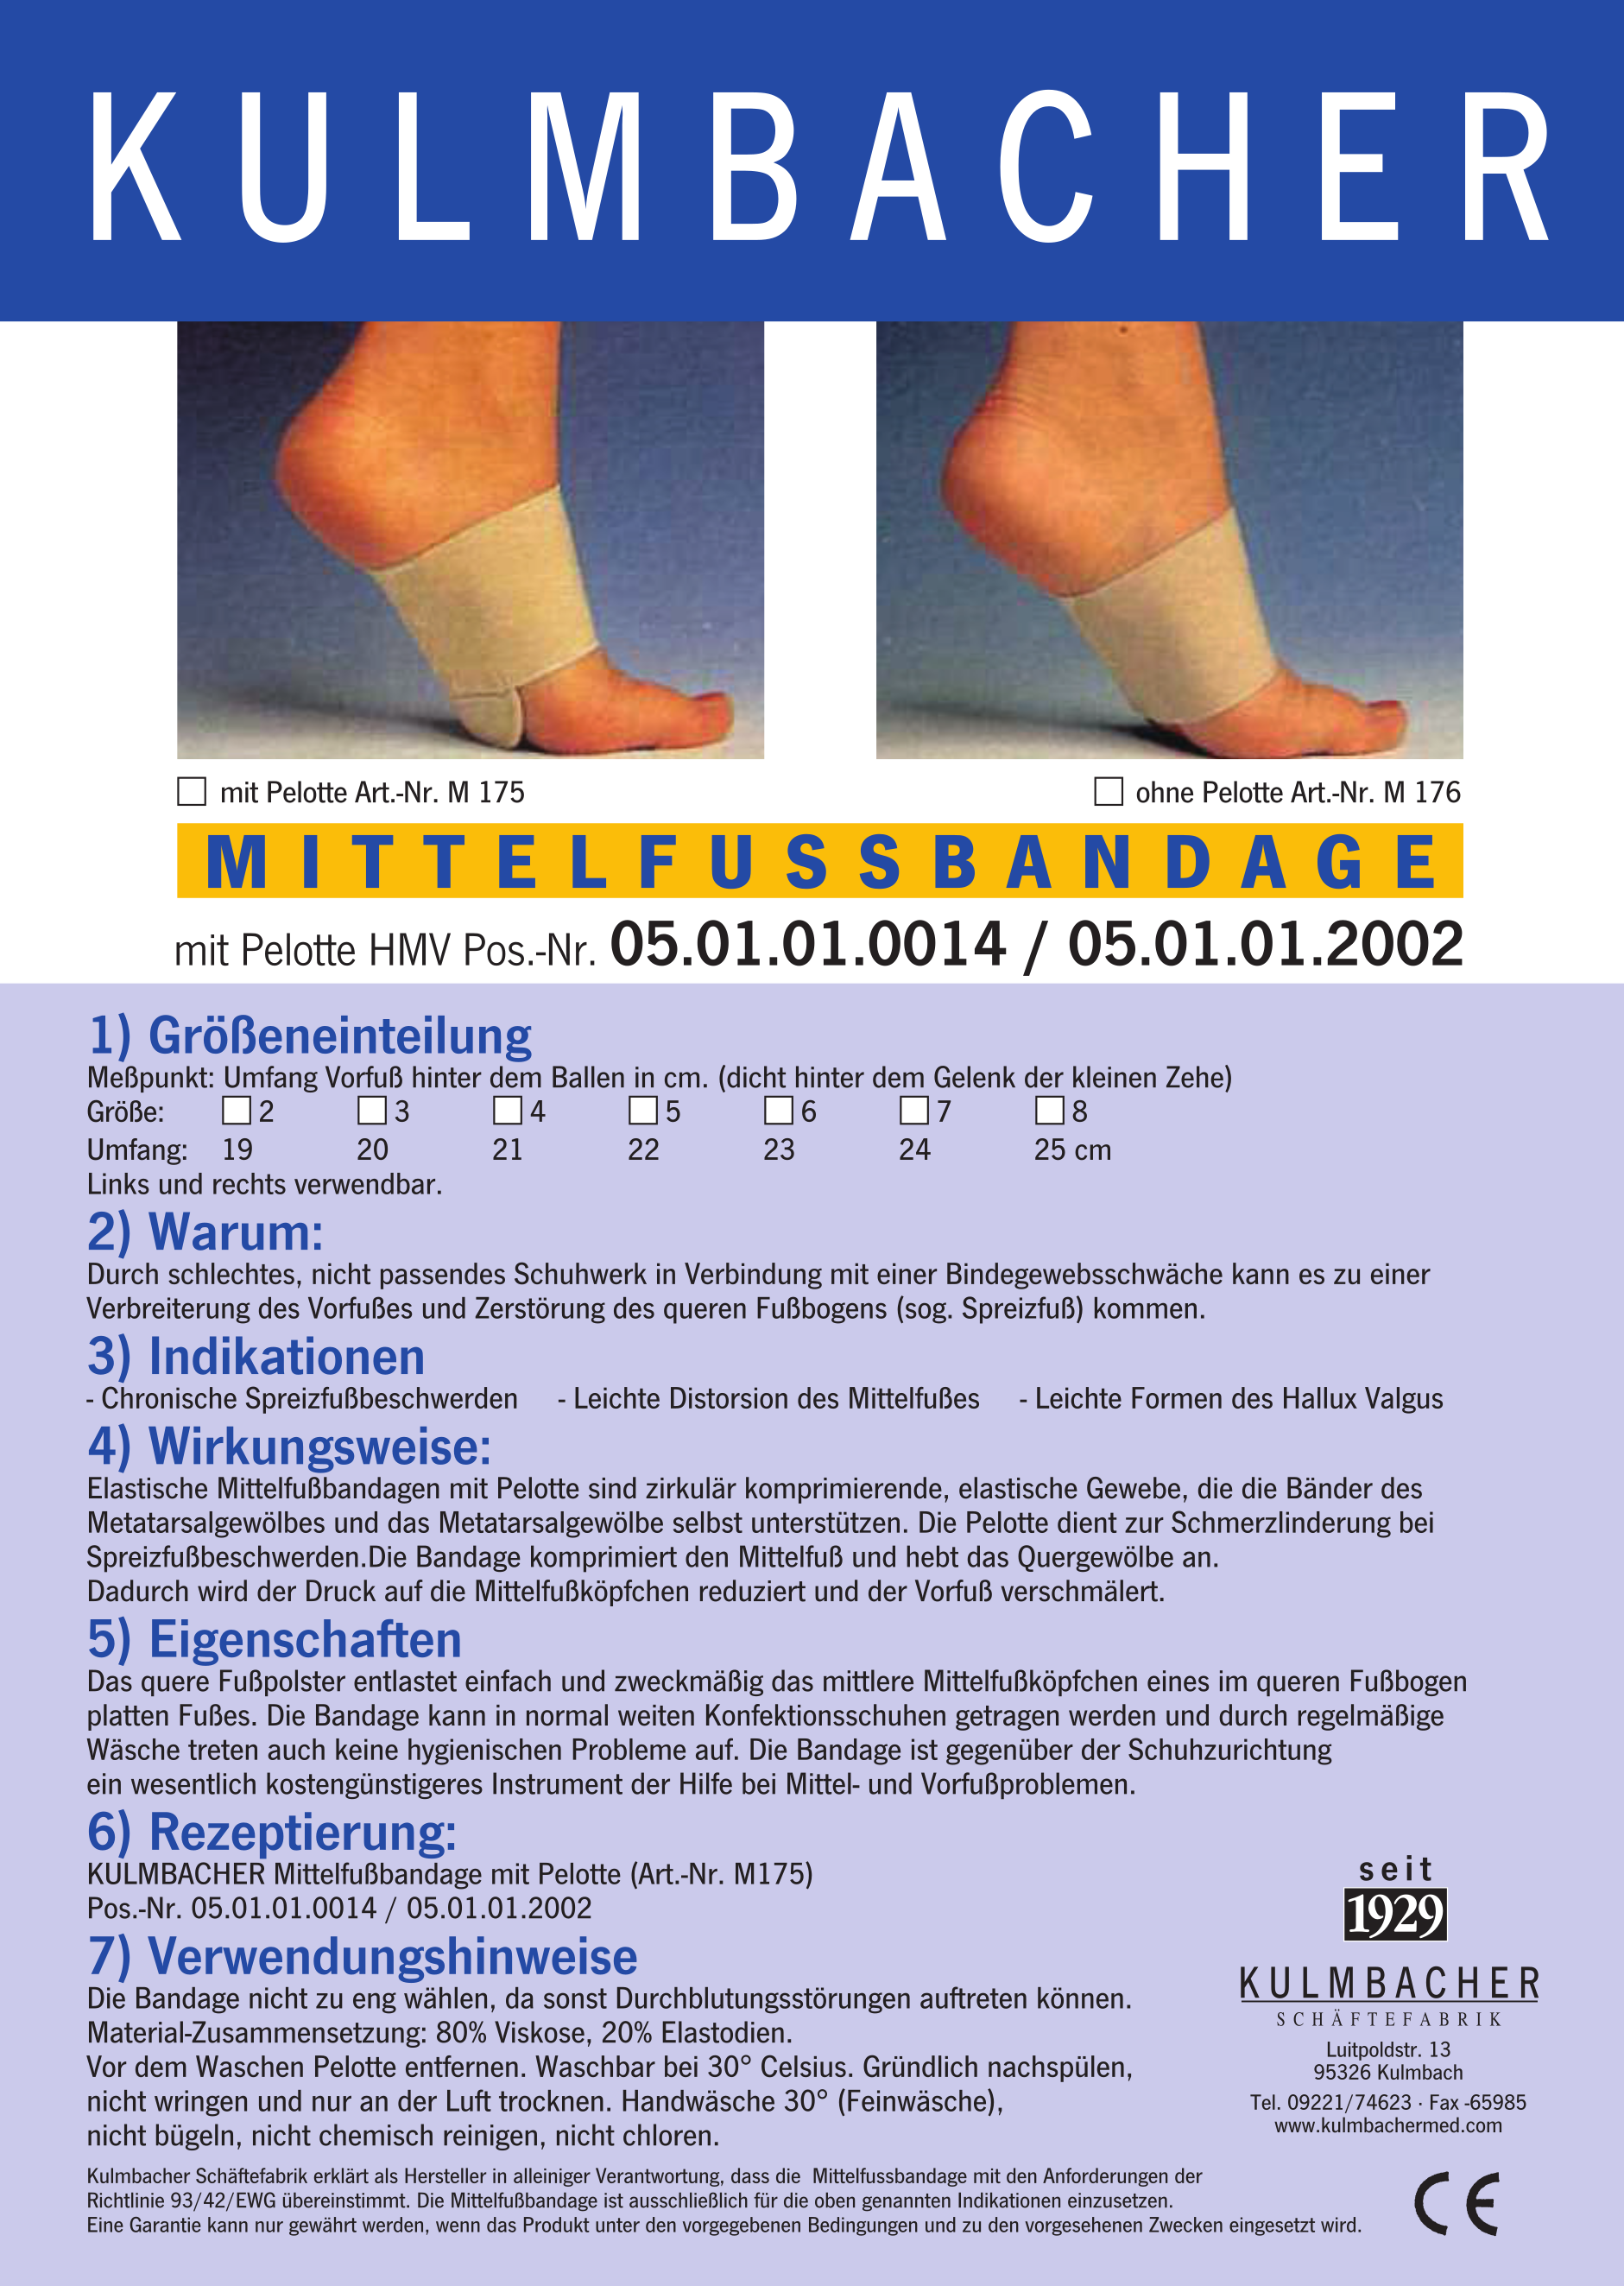 MITTELFUSS Bandage Prospekt